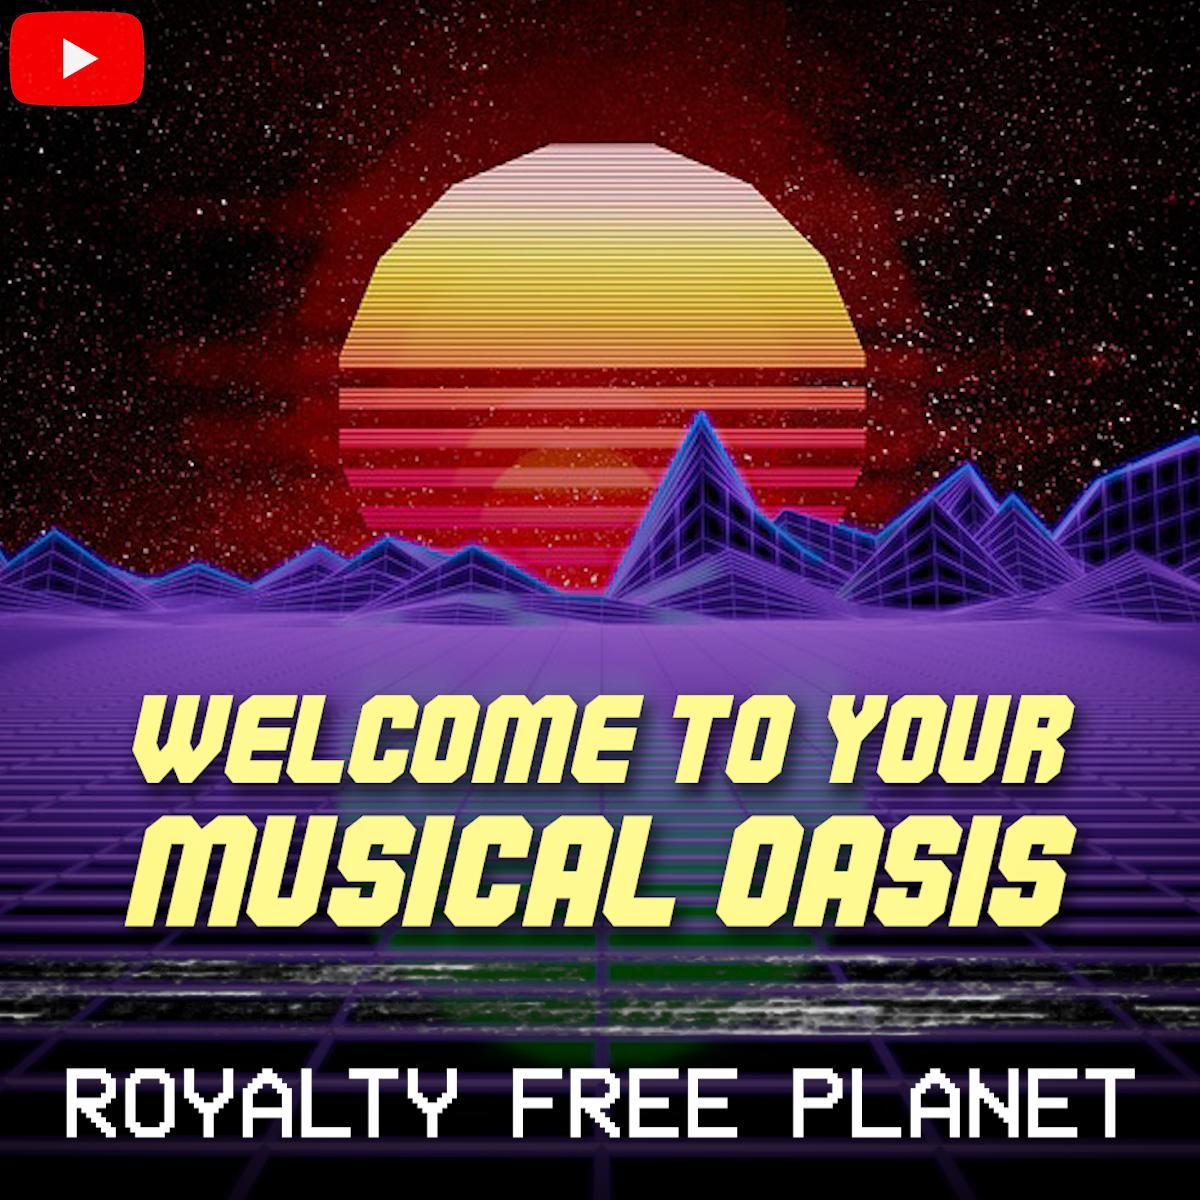 Royalty Free Planet (@RoyalFreePlanet) | Twitter